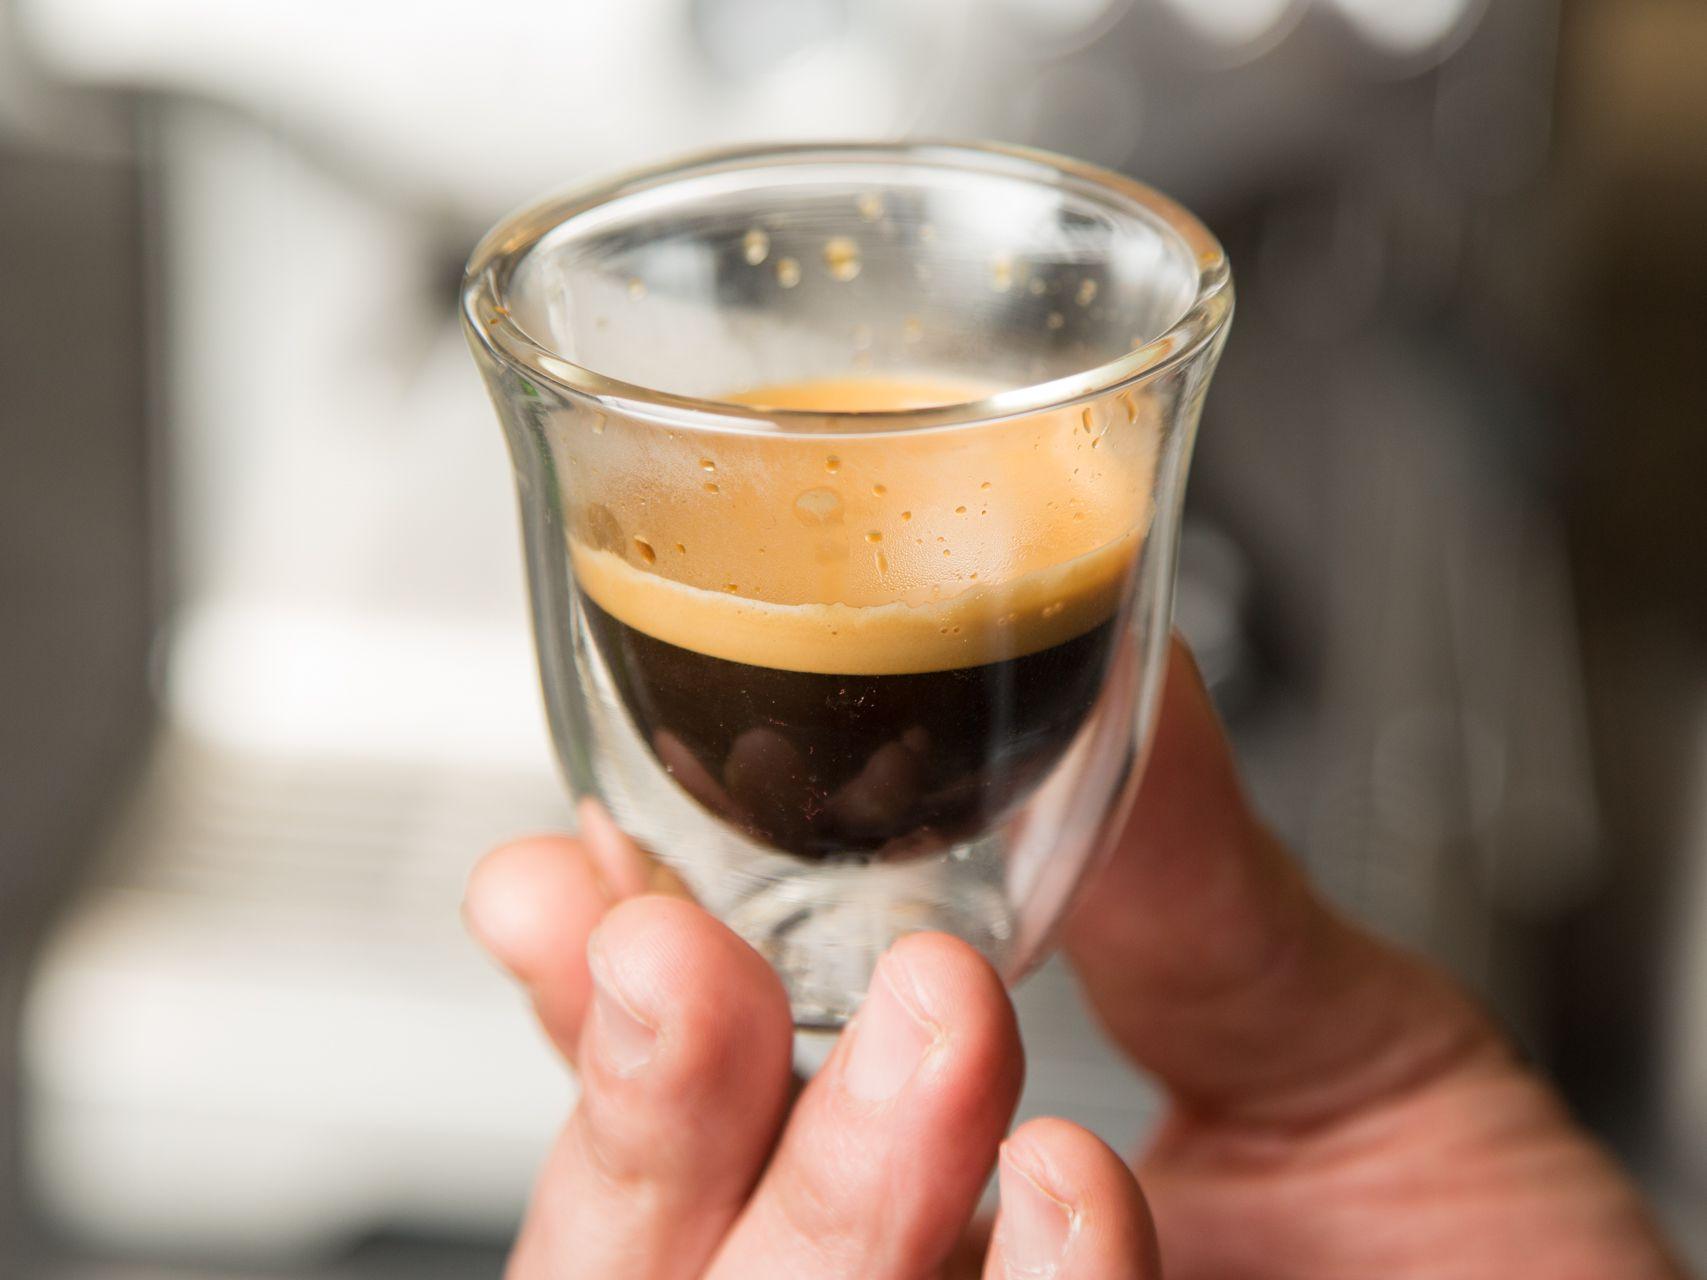 brevilleespressoproductphotos-7.jpg